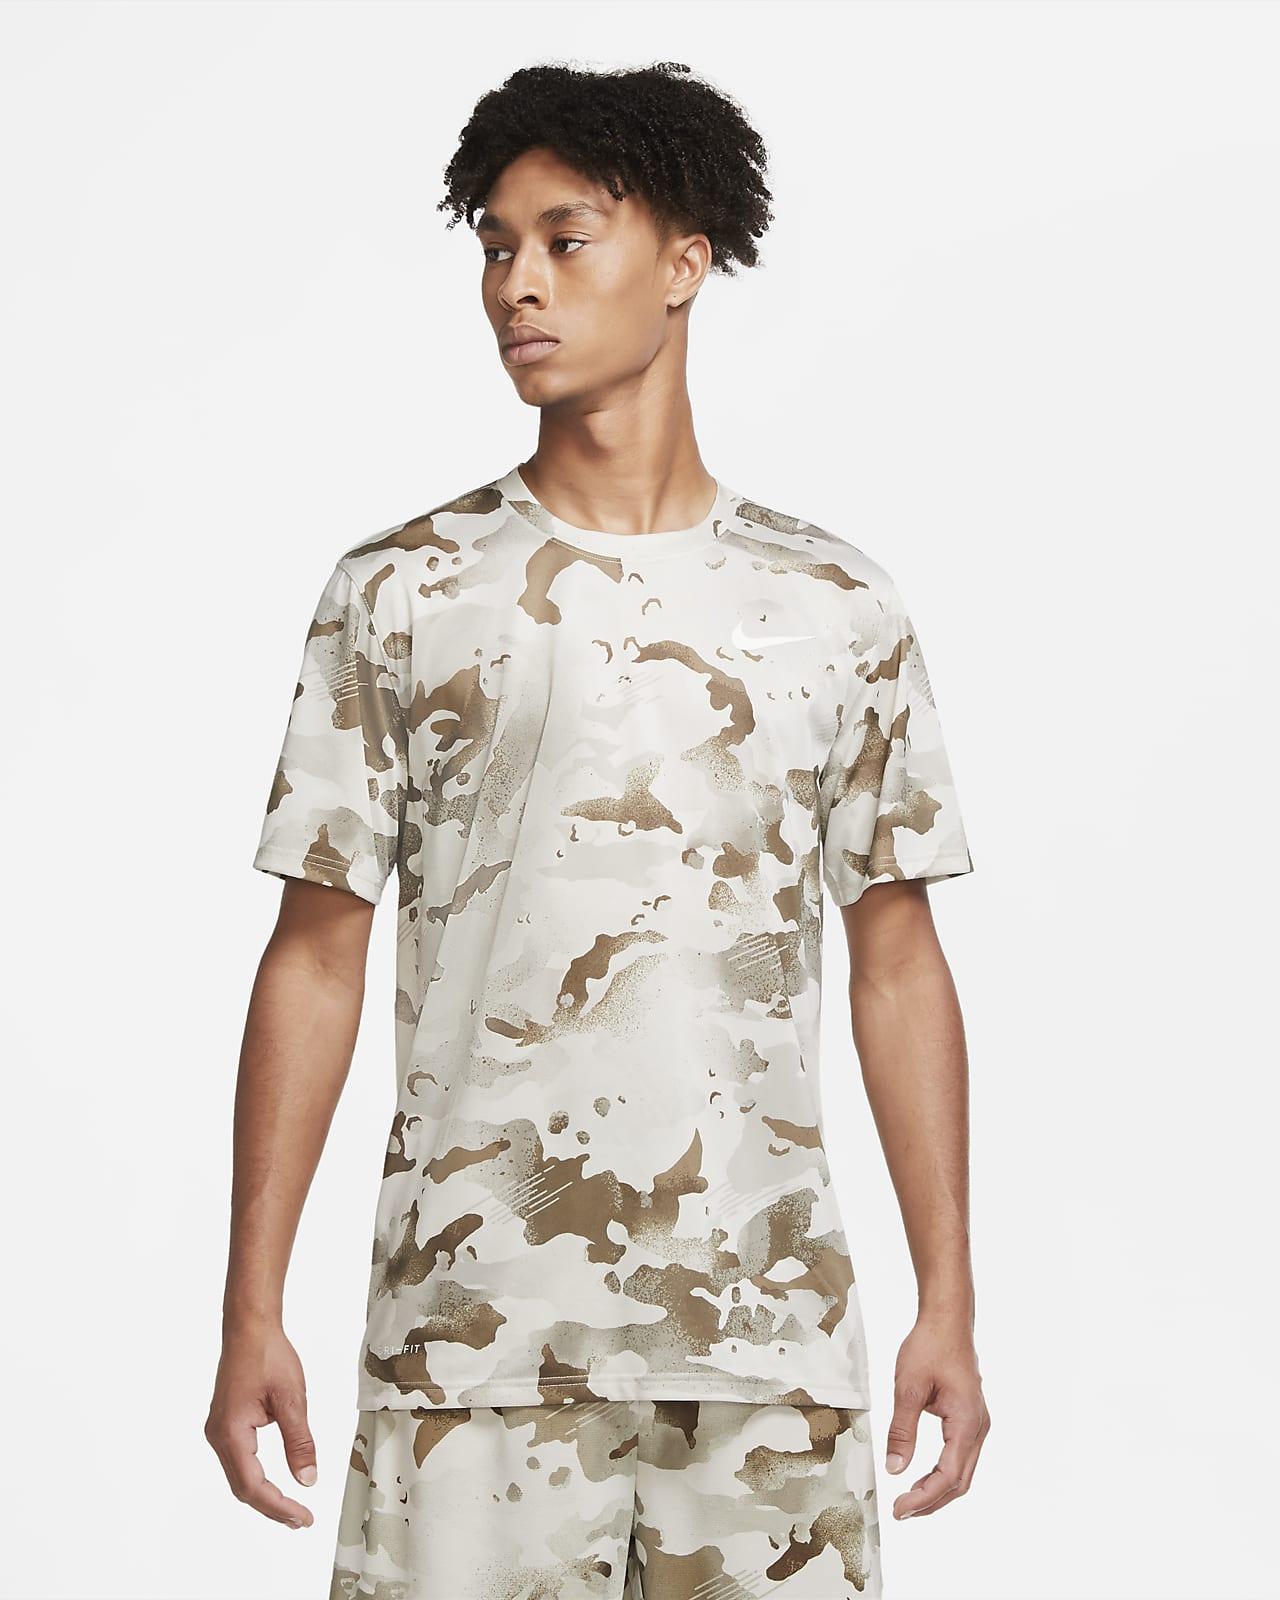 Nike Dri-FIT Trainings-T-Shirt im Camo-Design für Herren